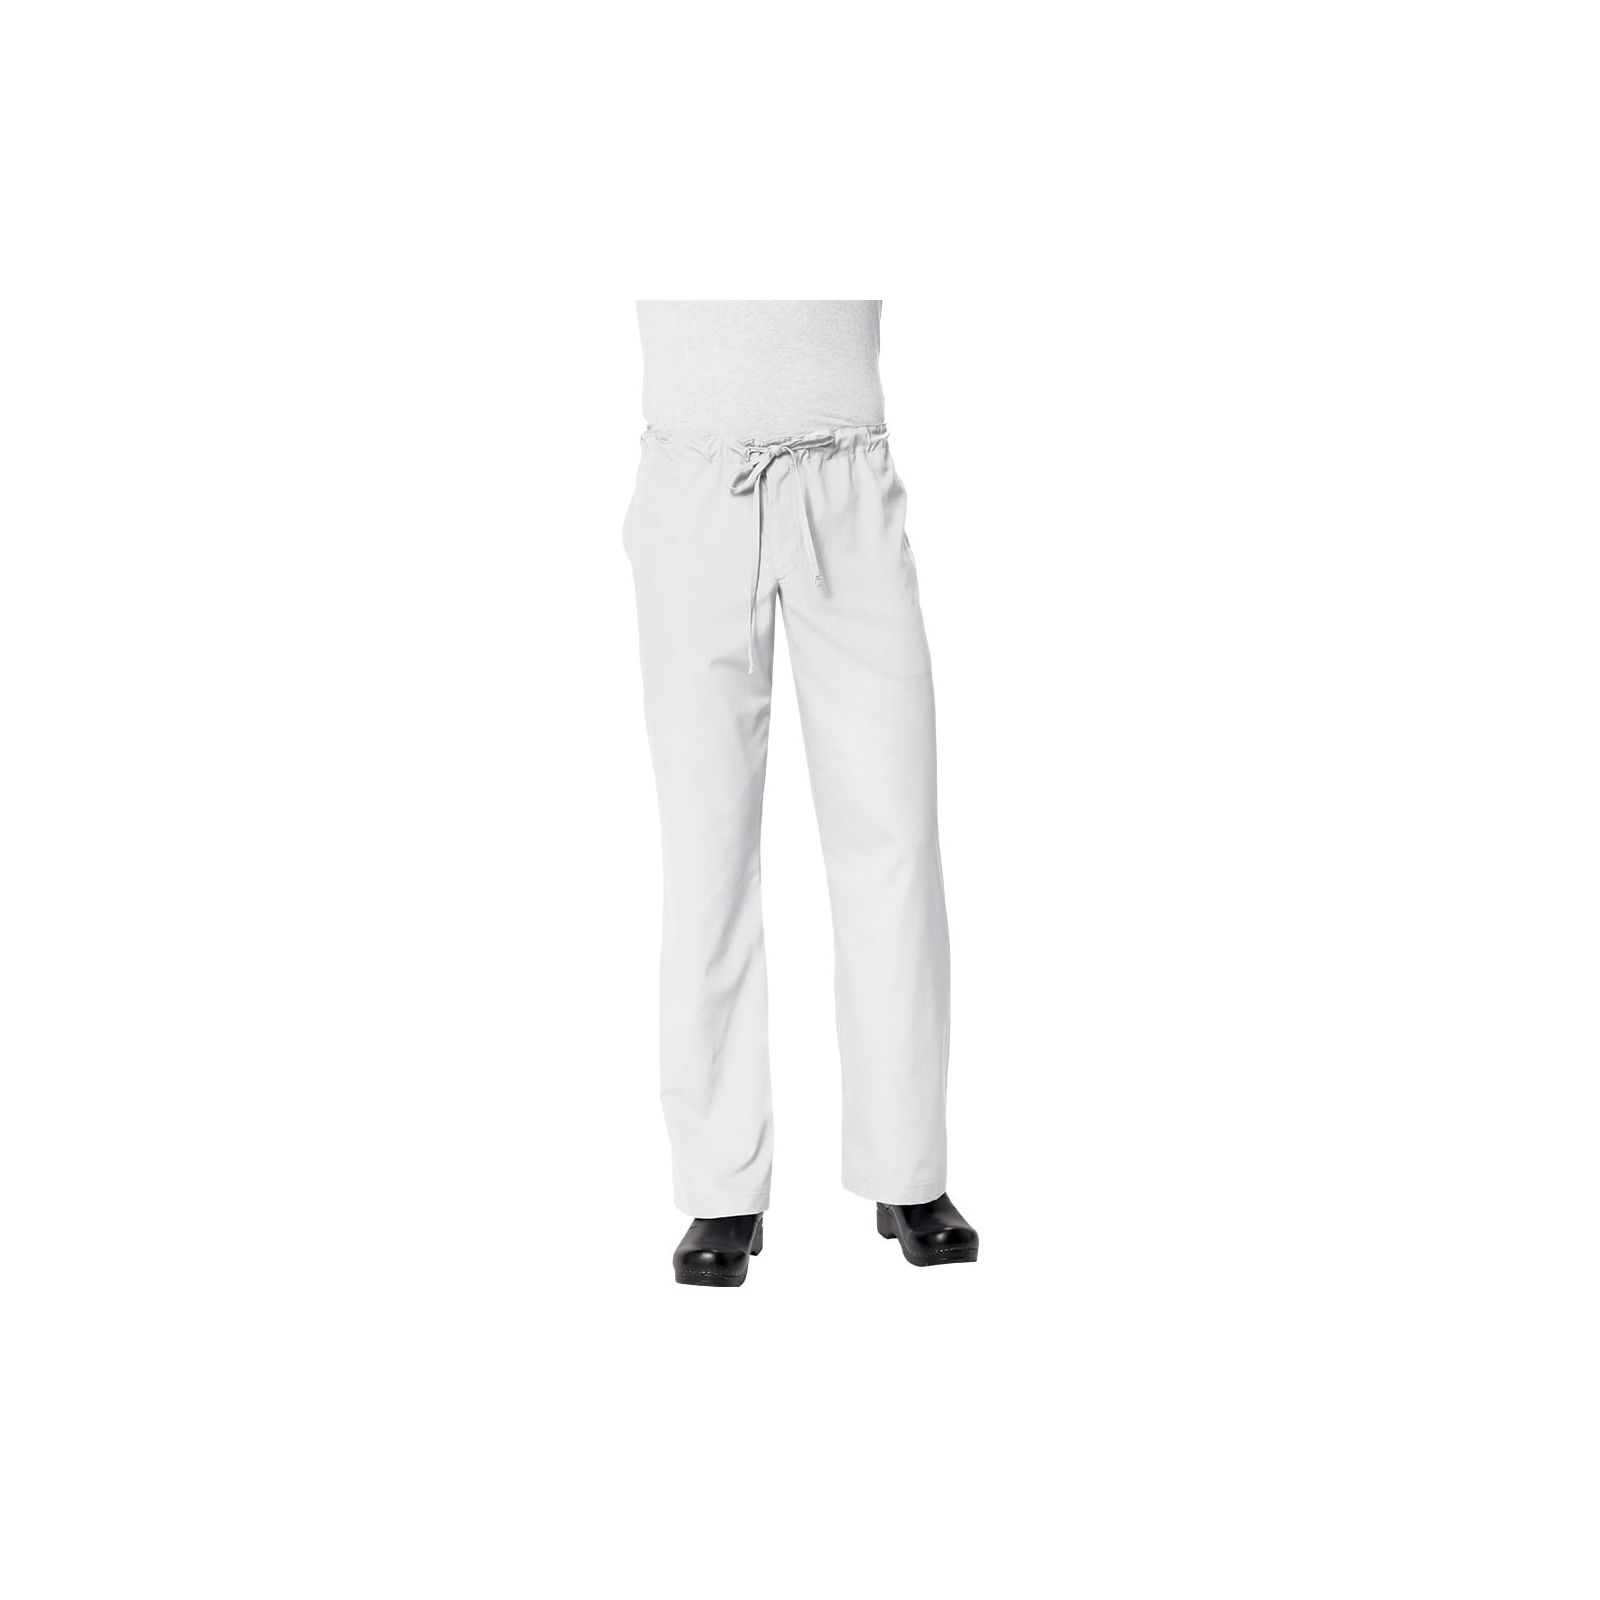 "Pantalon médical Homme ""Dockweiler"", Koi collection Orange (G3703) blanc"